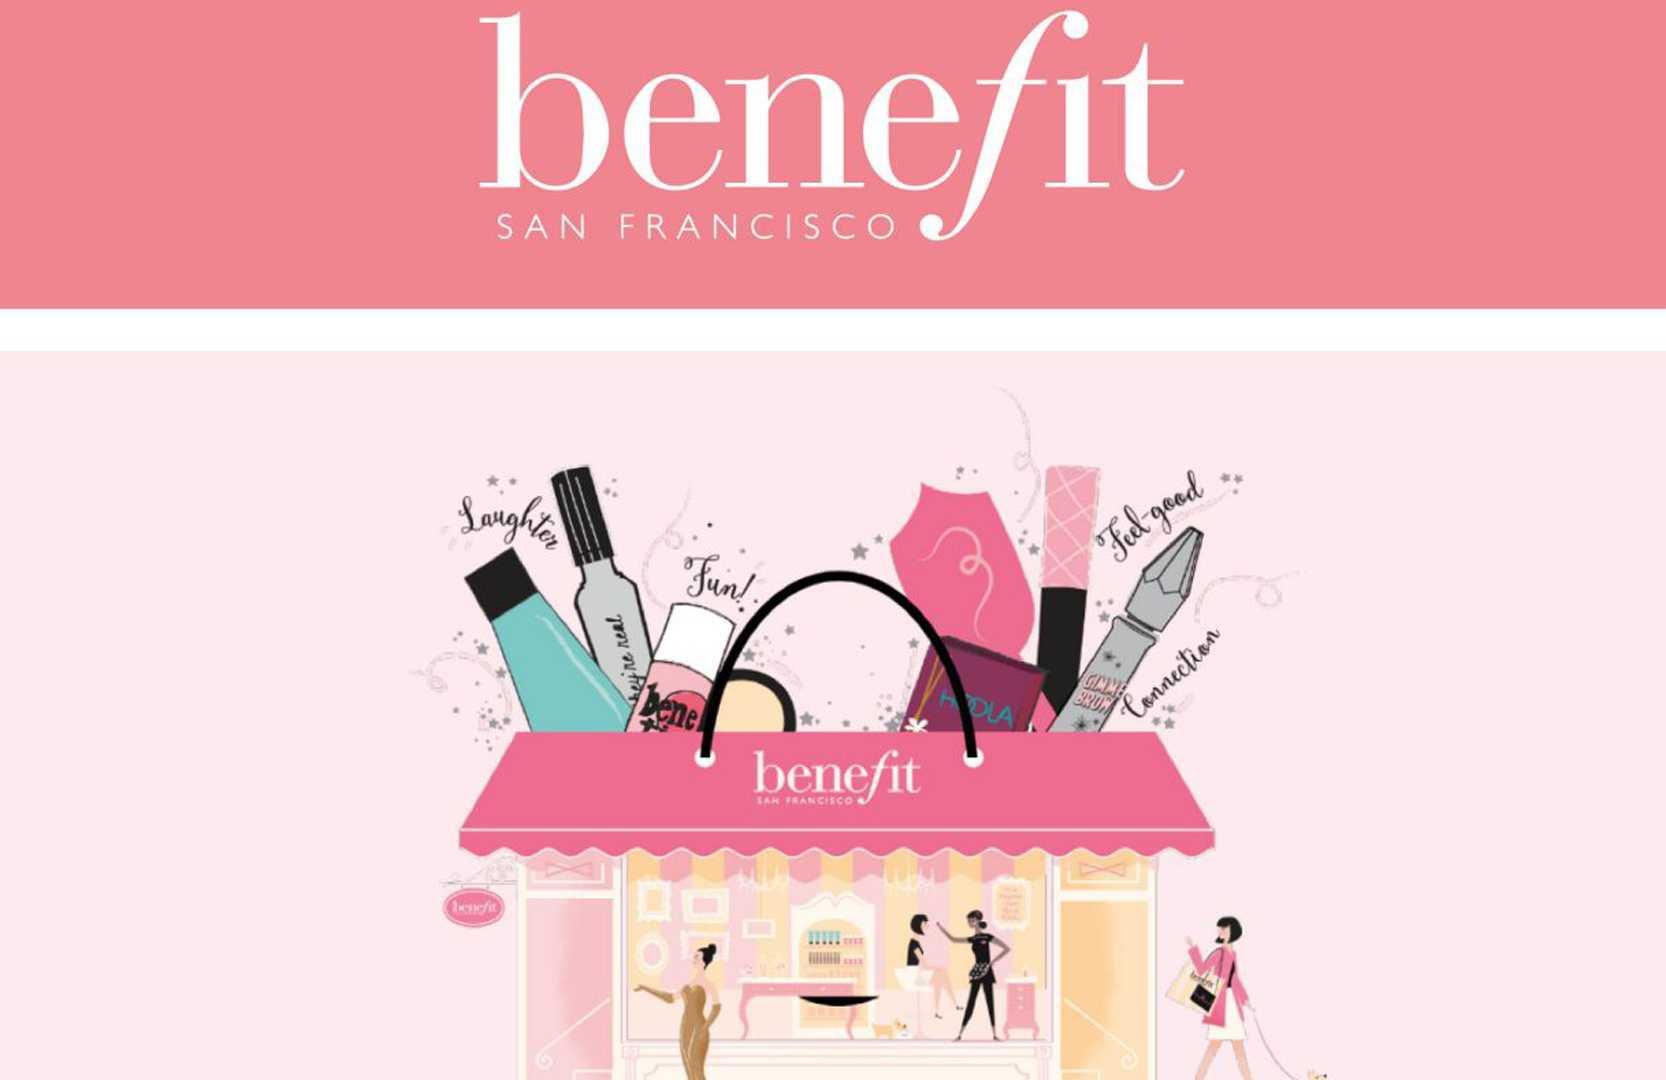 benefit-1555325697.jpg